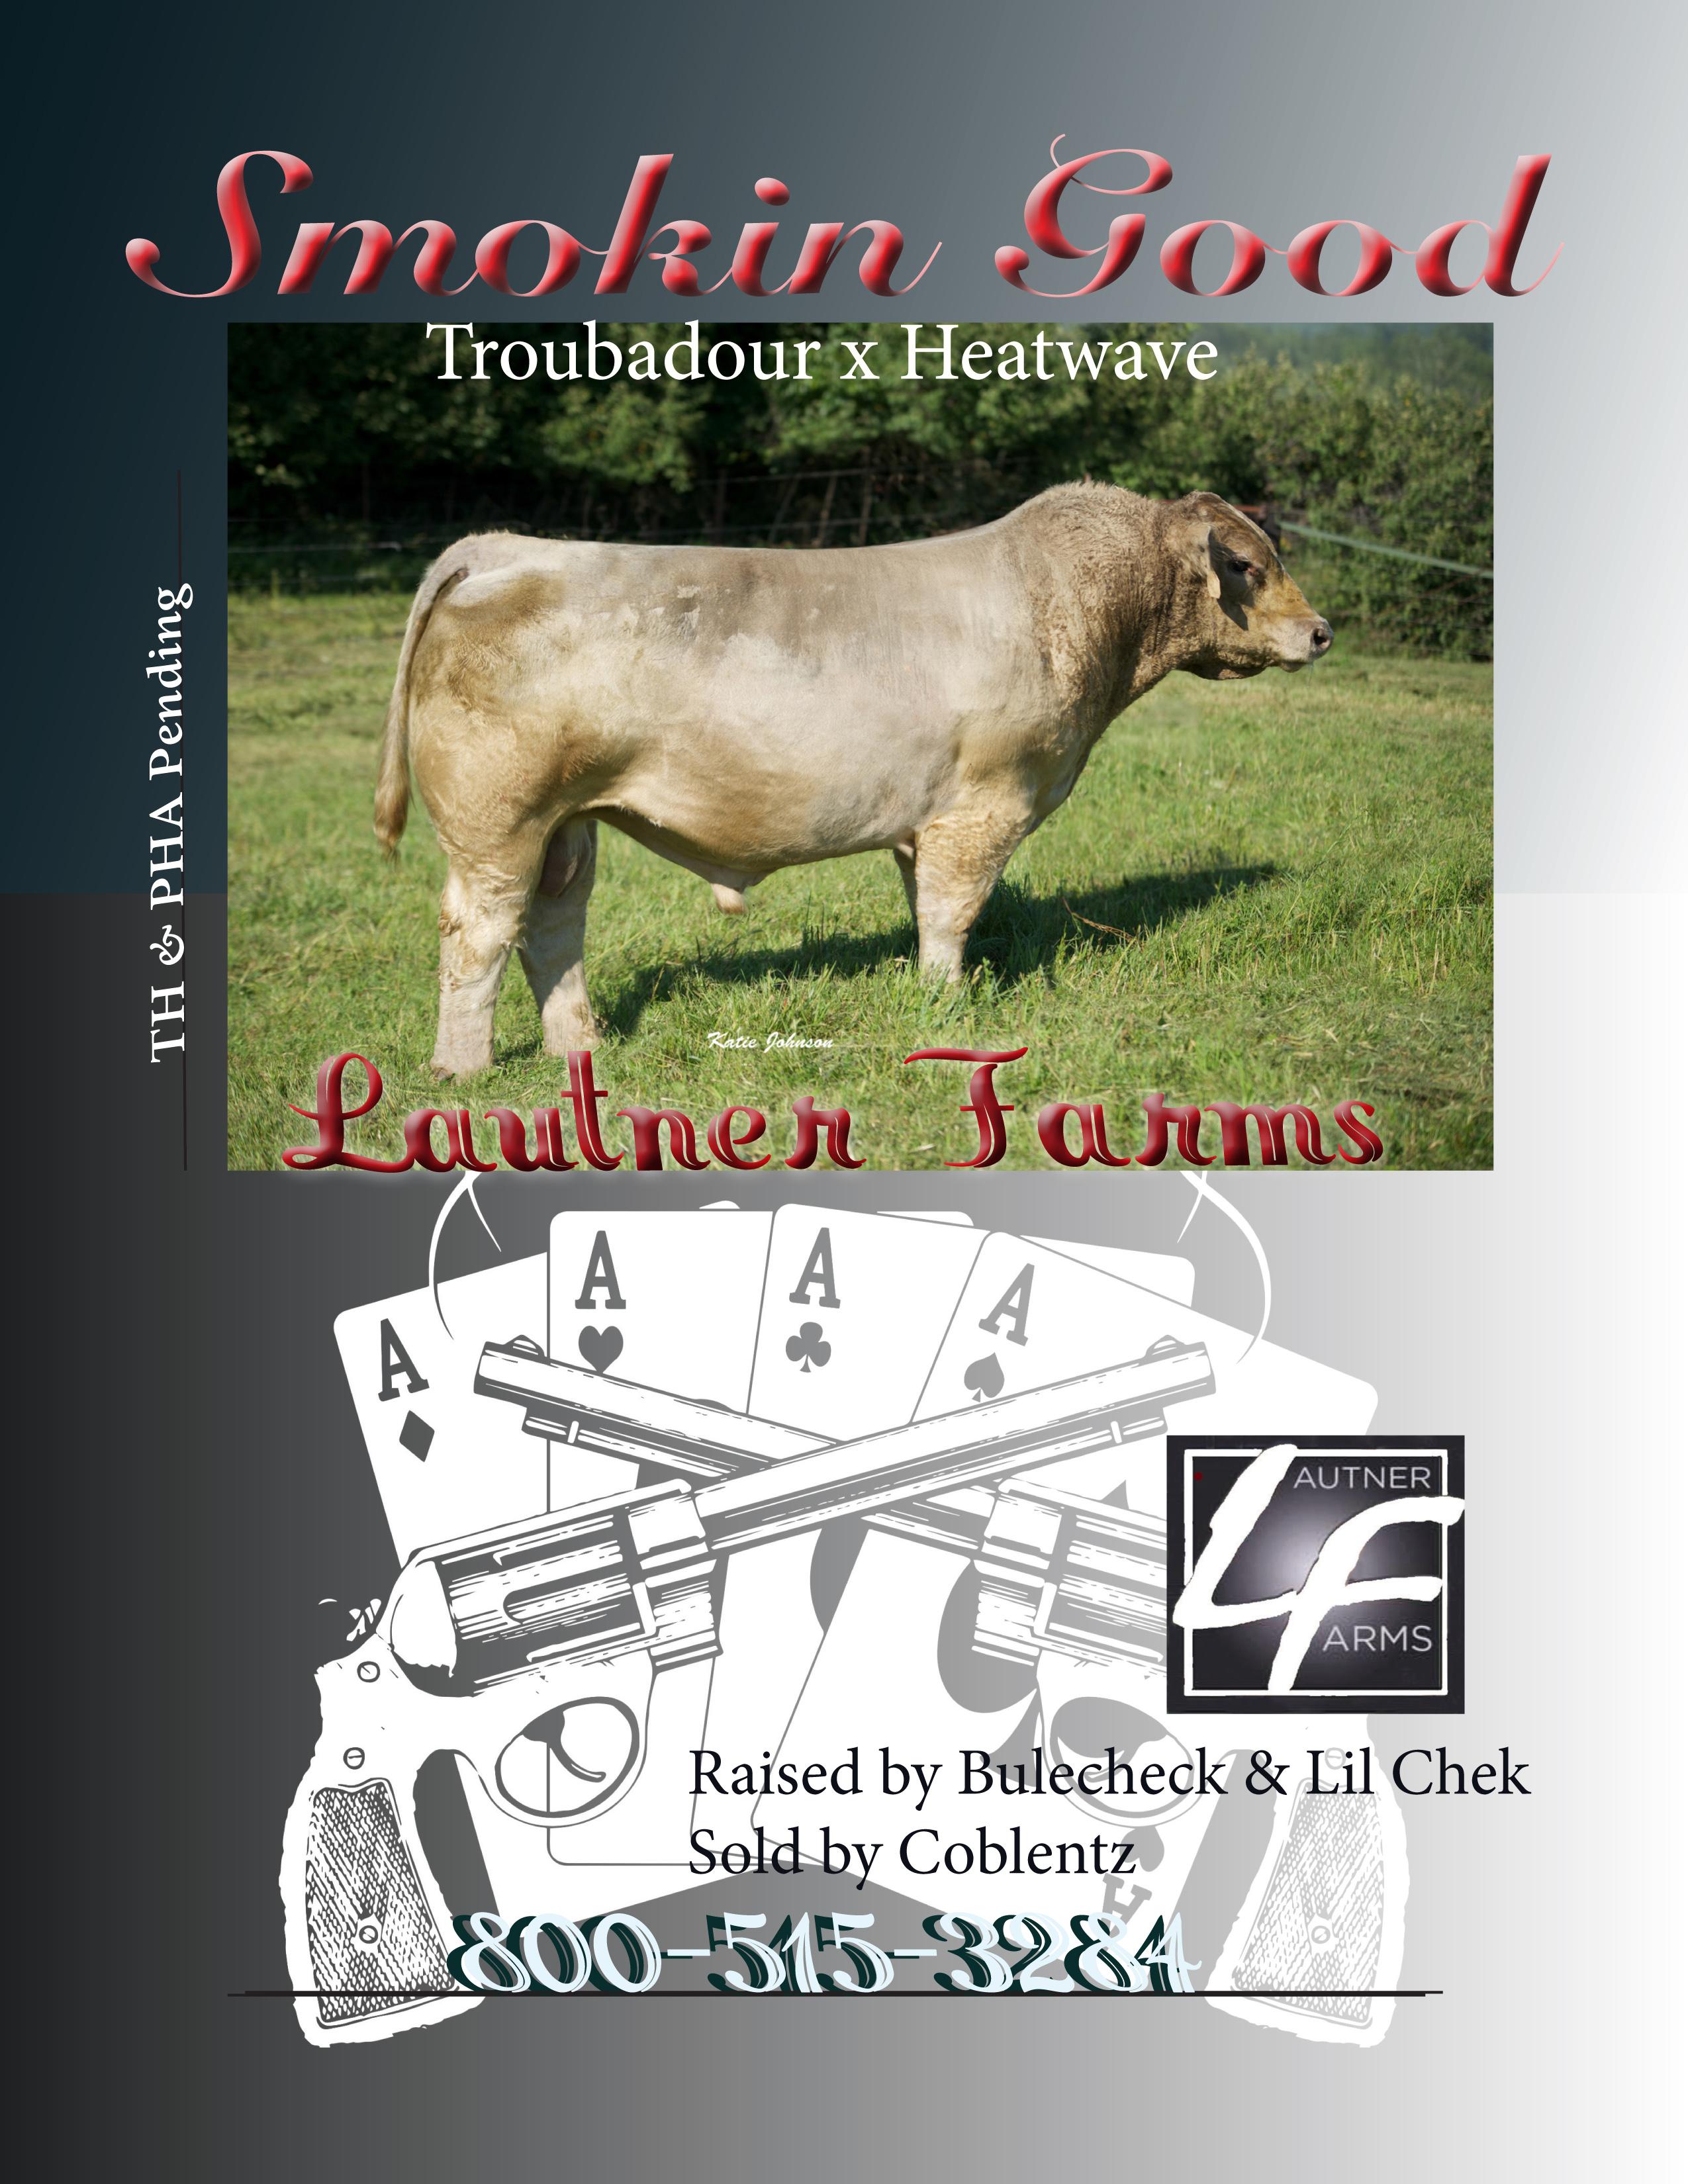 Smokin Good PDF with correct breeder